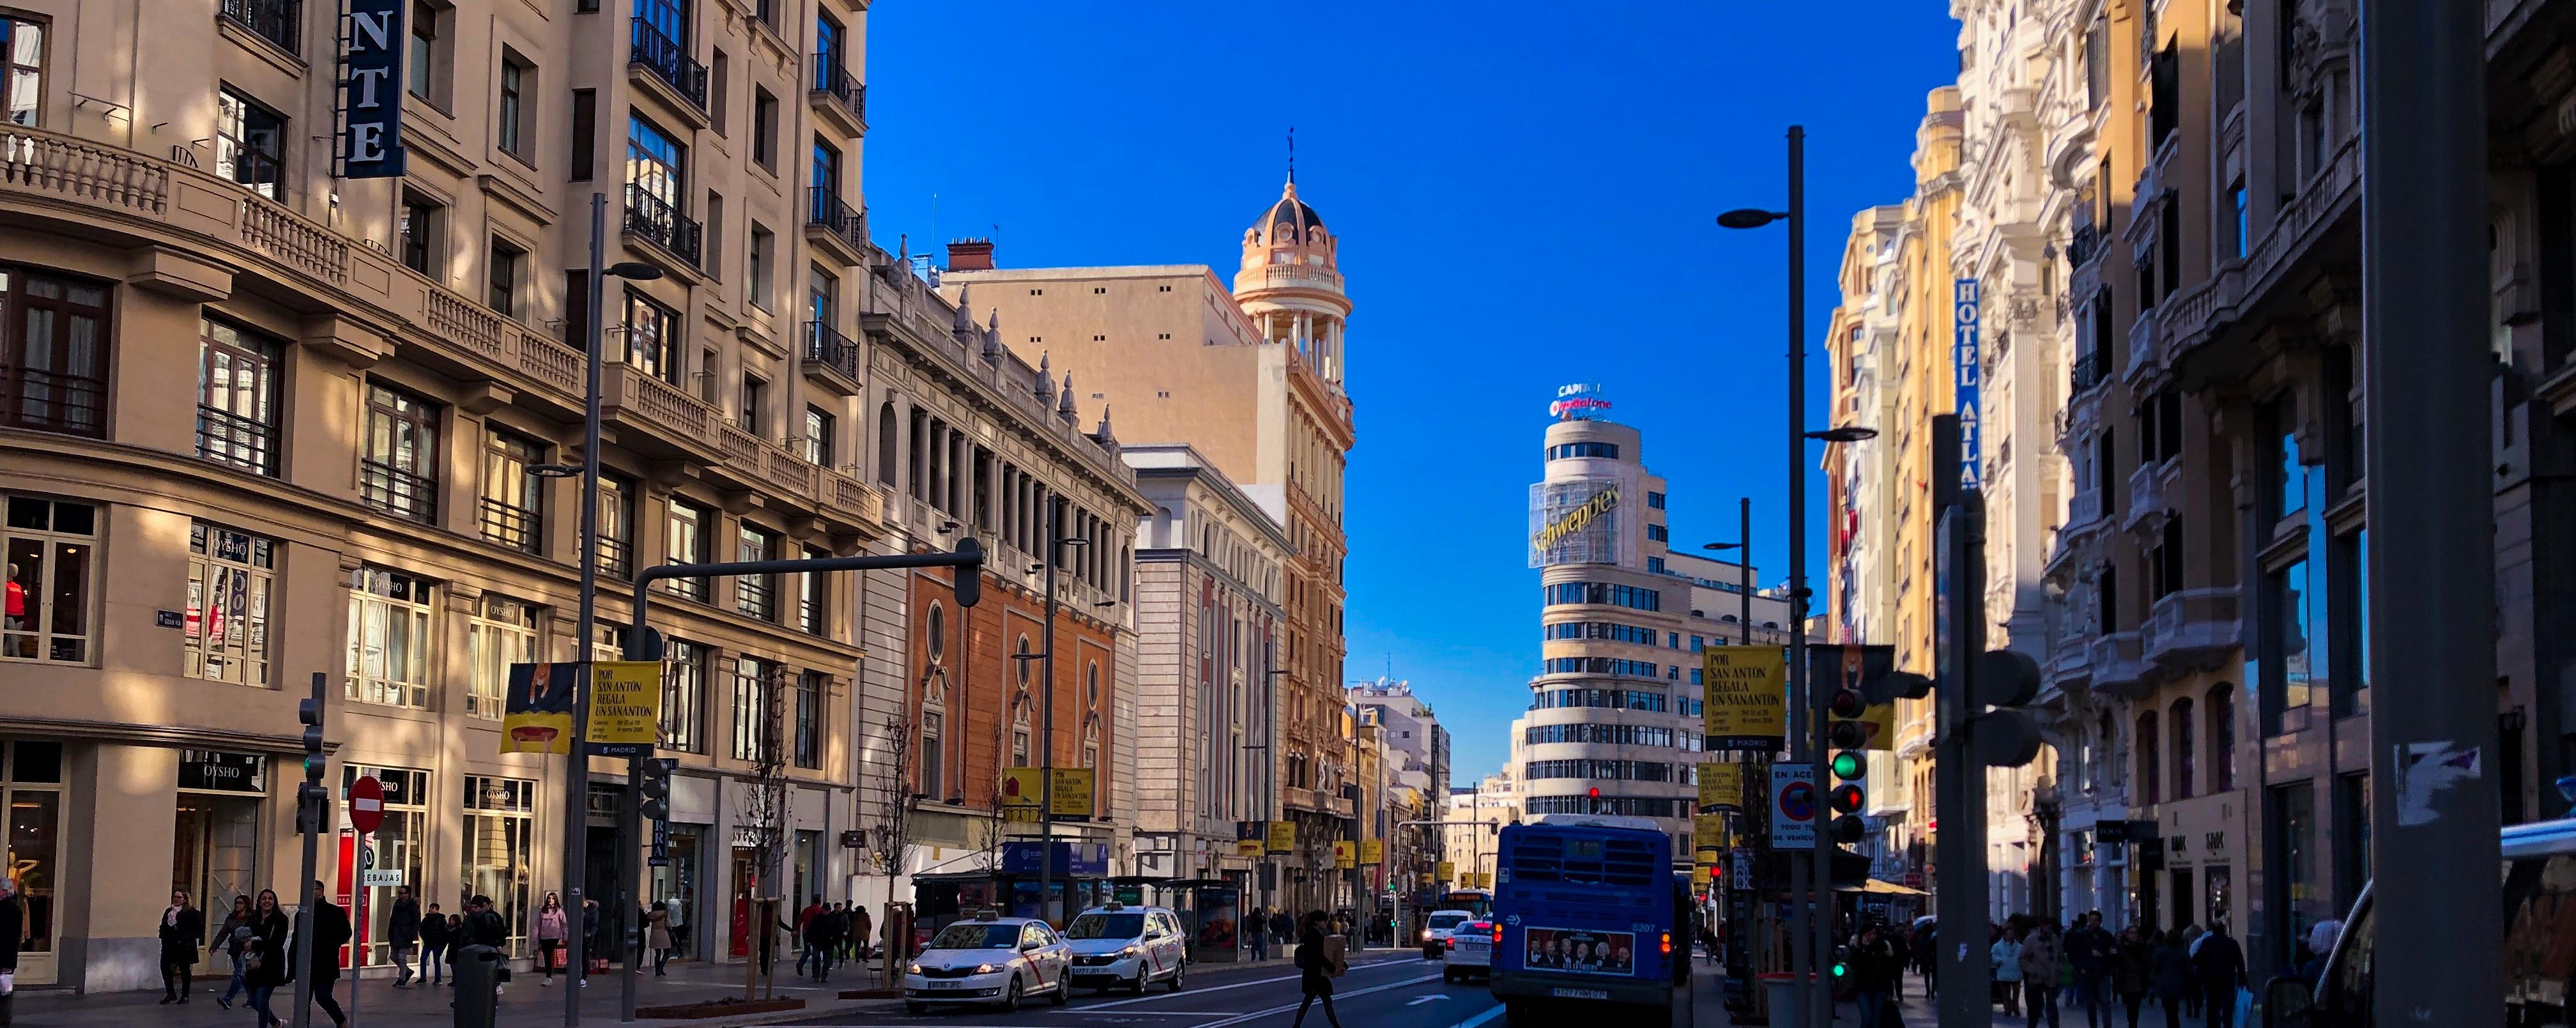 Madrid, Spain gran via